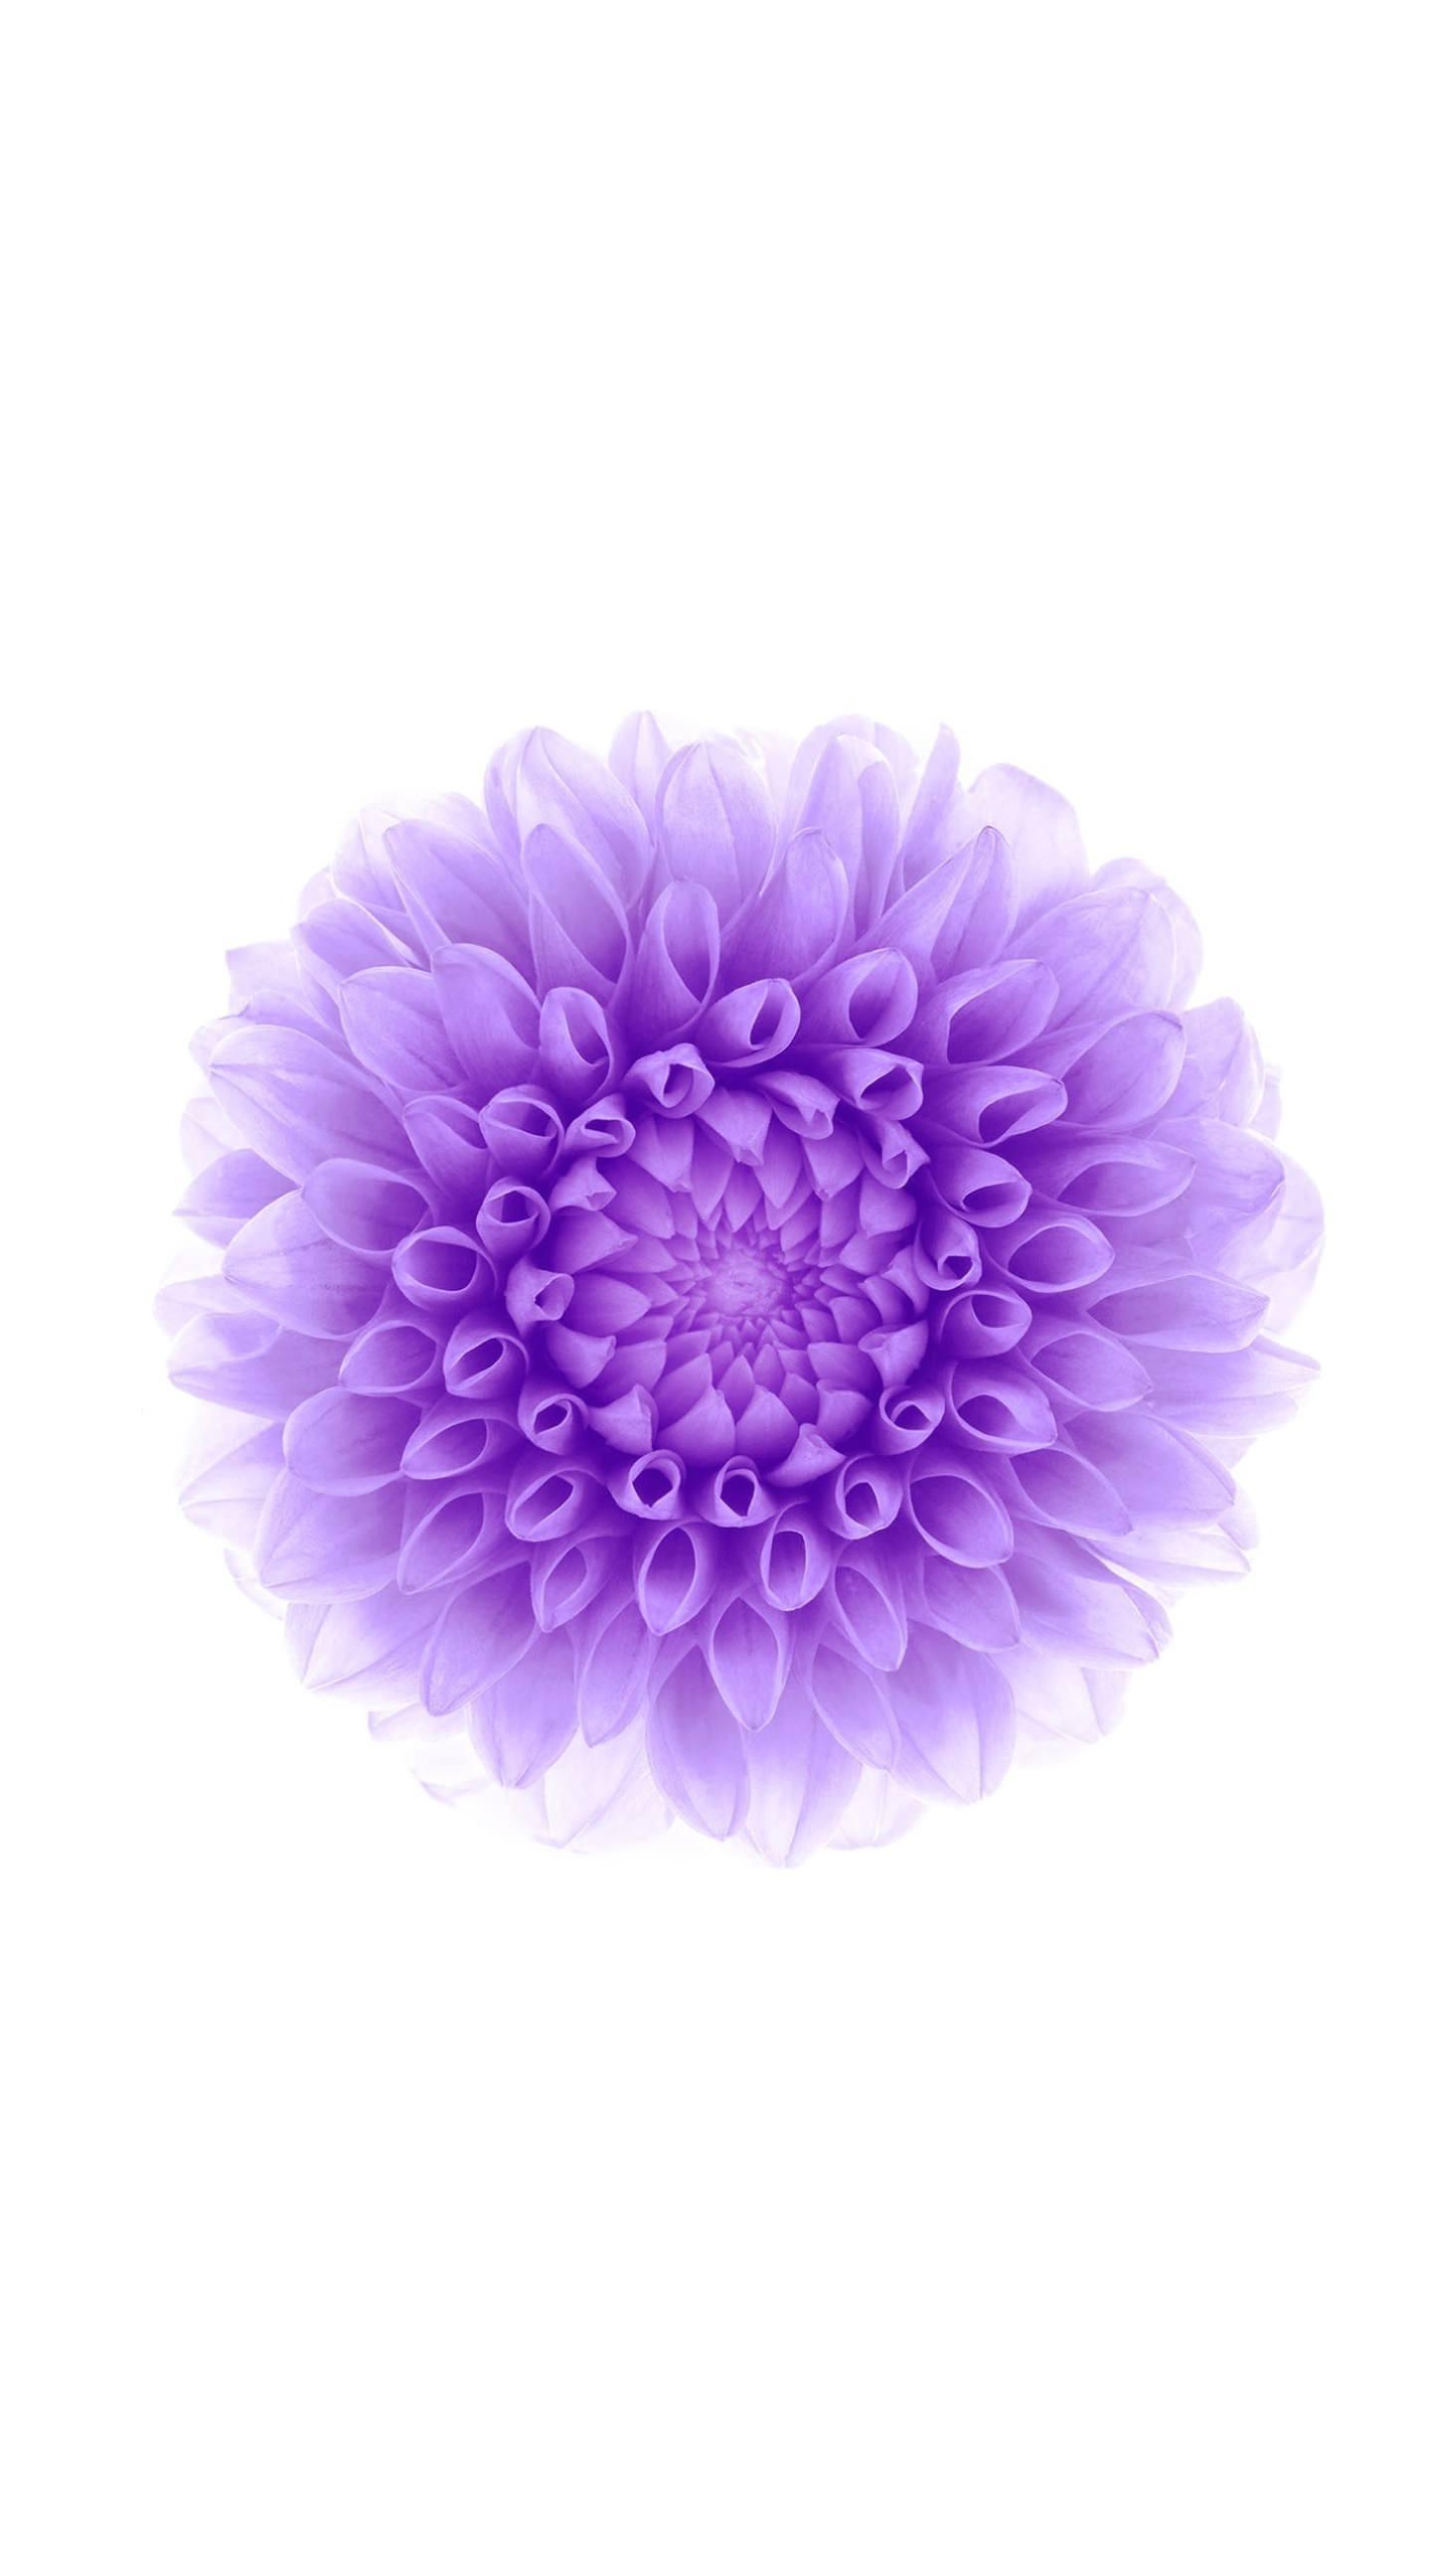 Flower Purple White Wallpaper Sc Iphone6splus